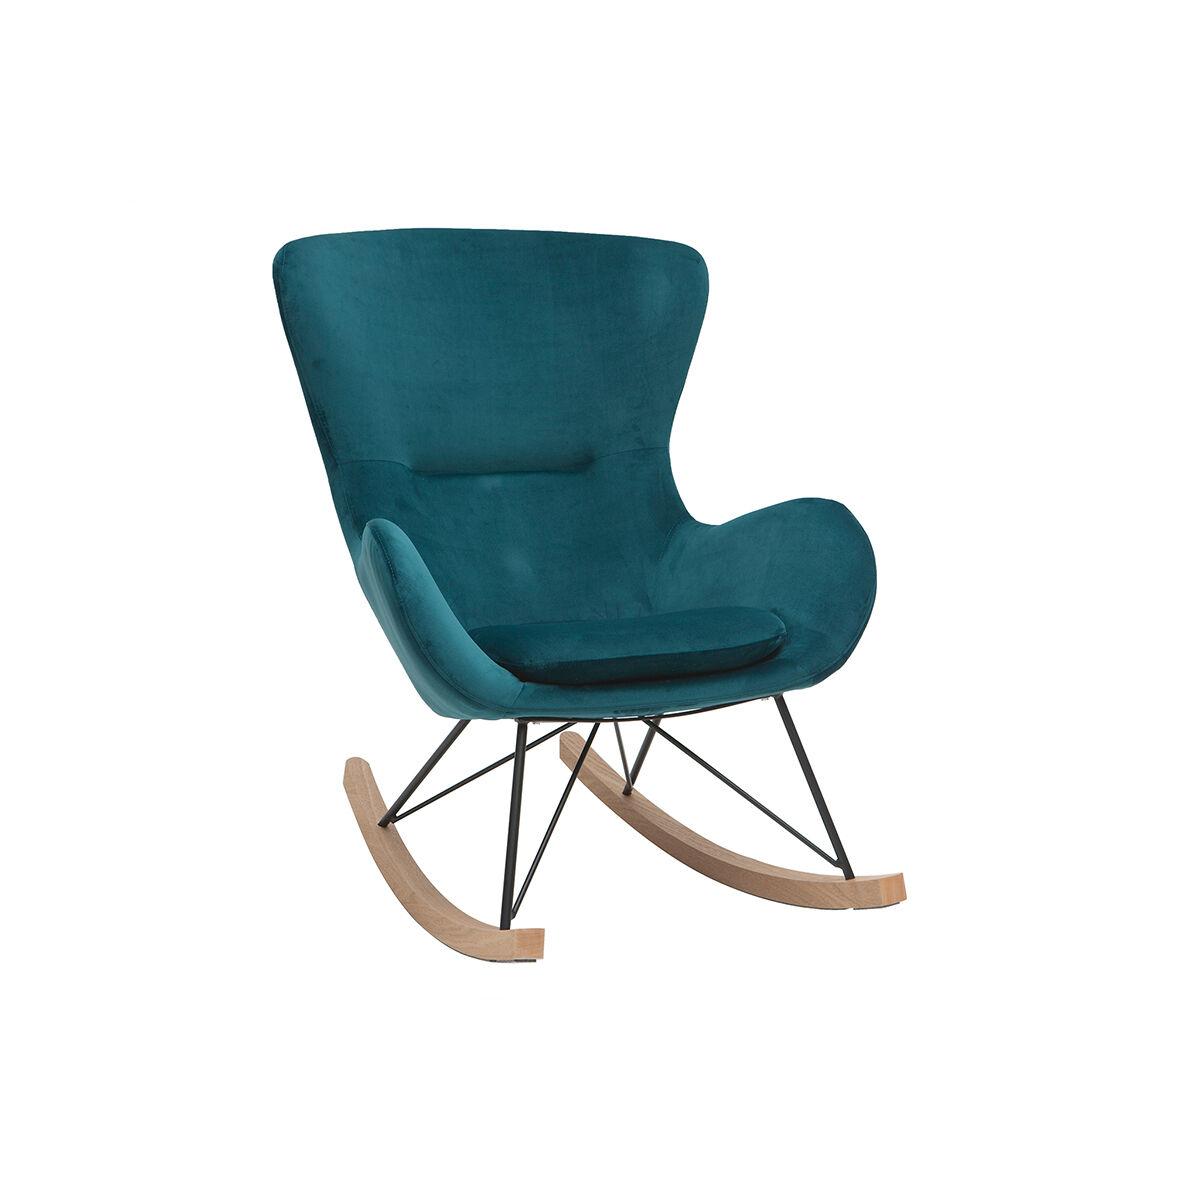 Miliboo Rocking chair design velours bleu pétrole ESKUA